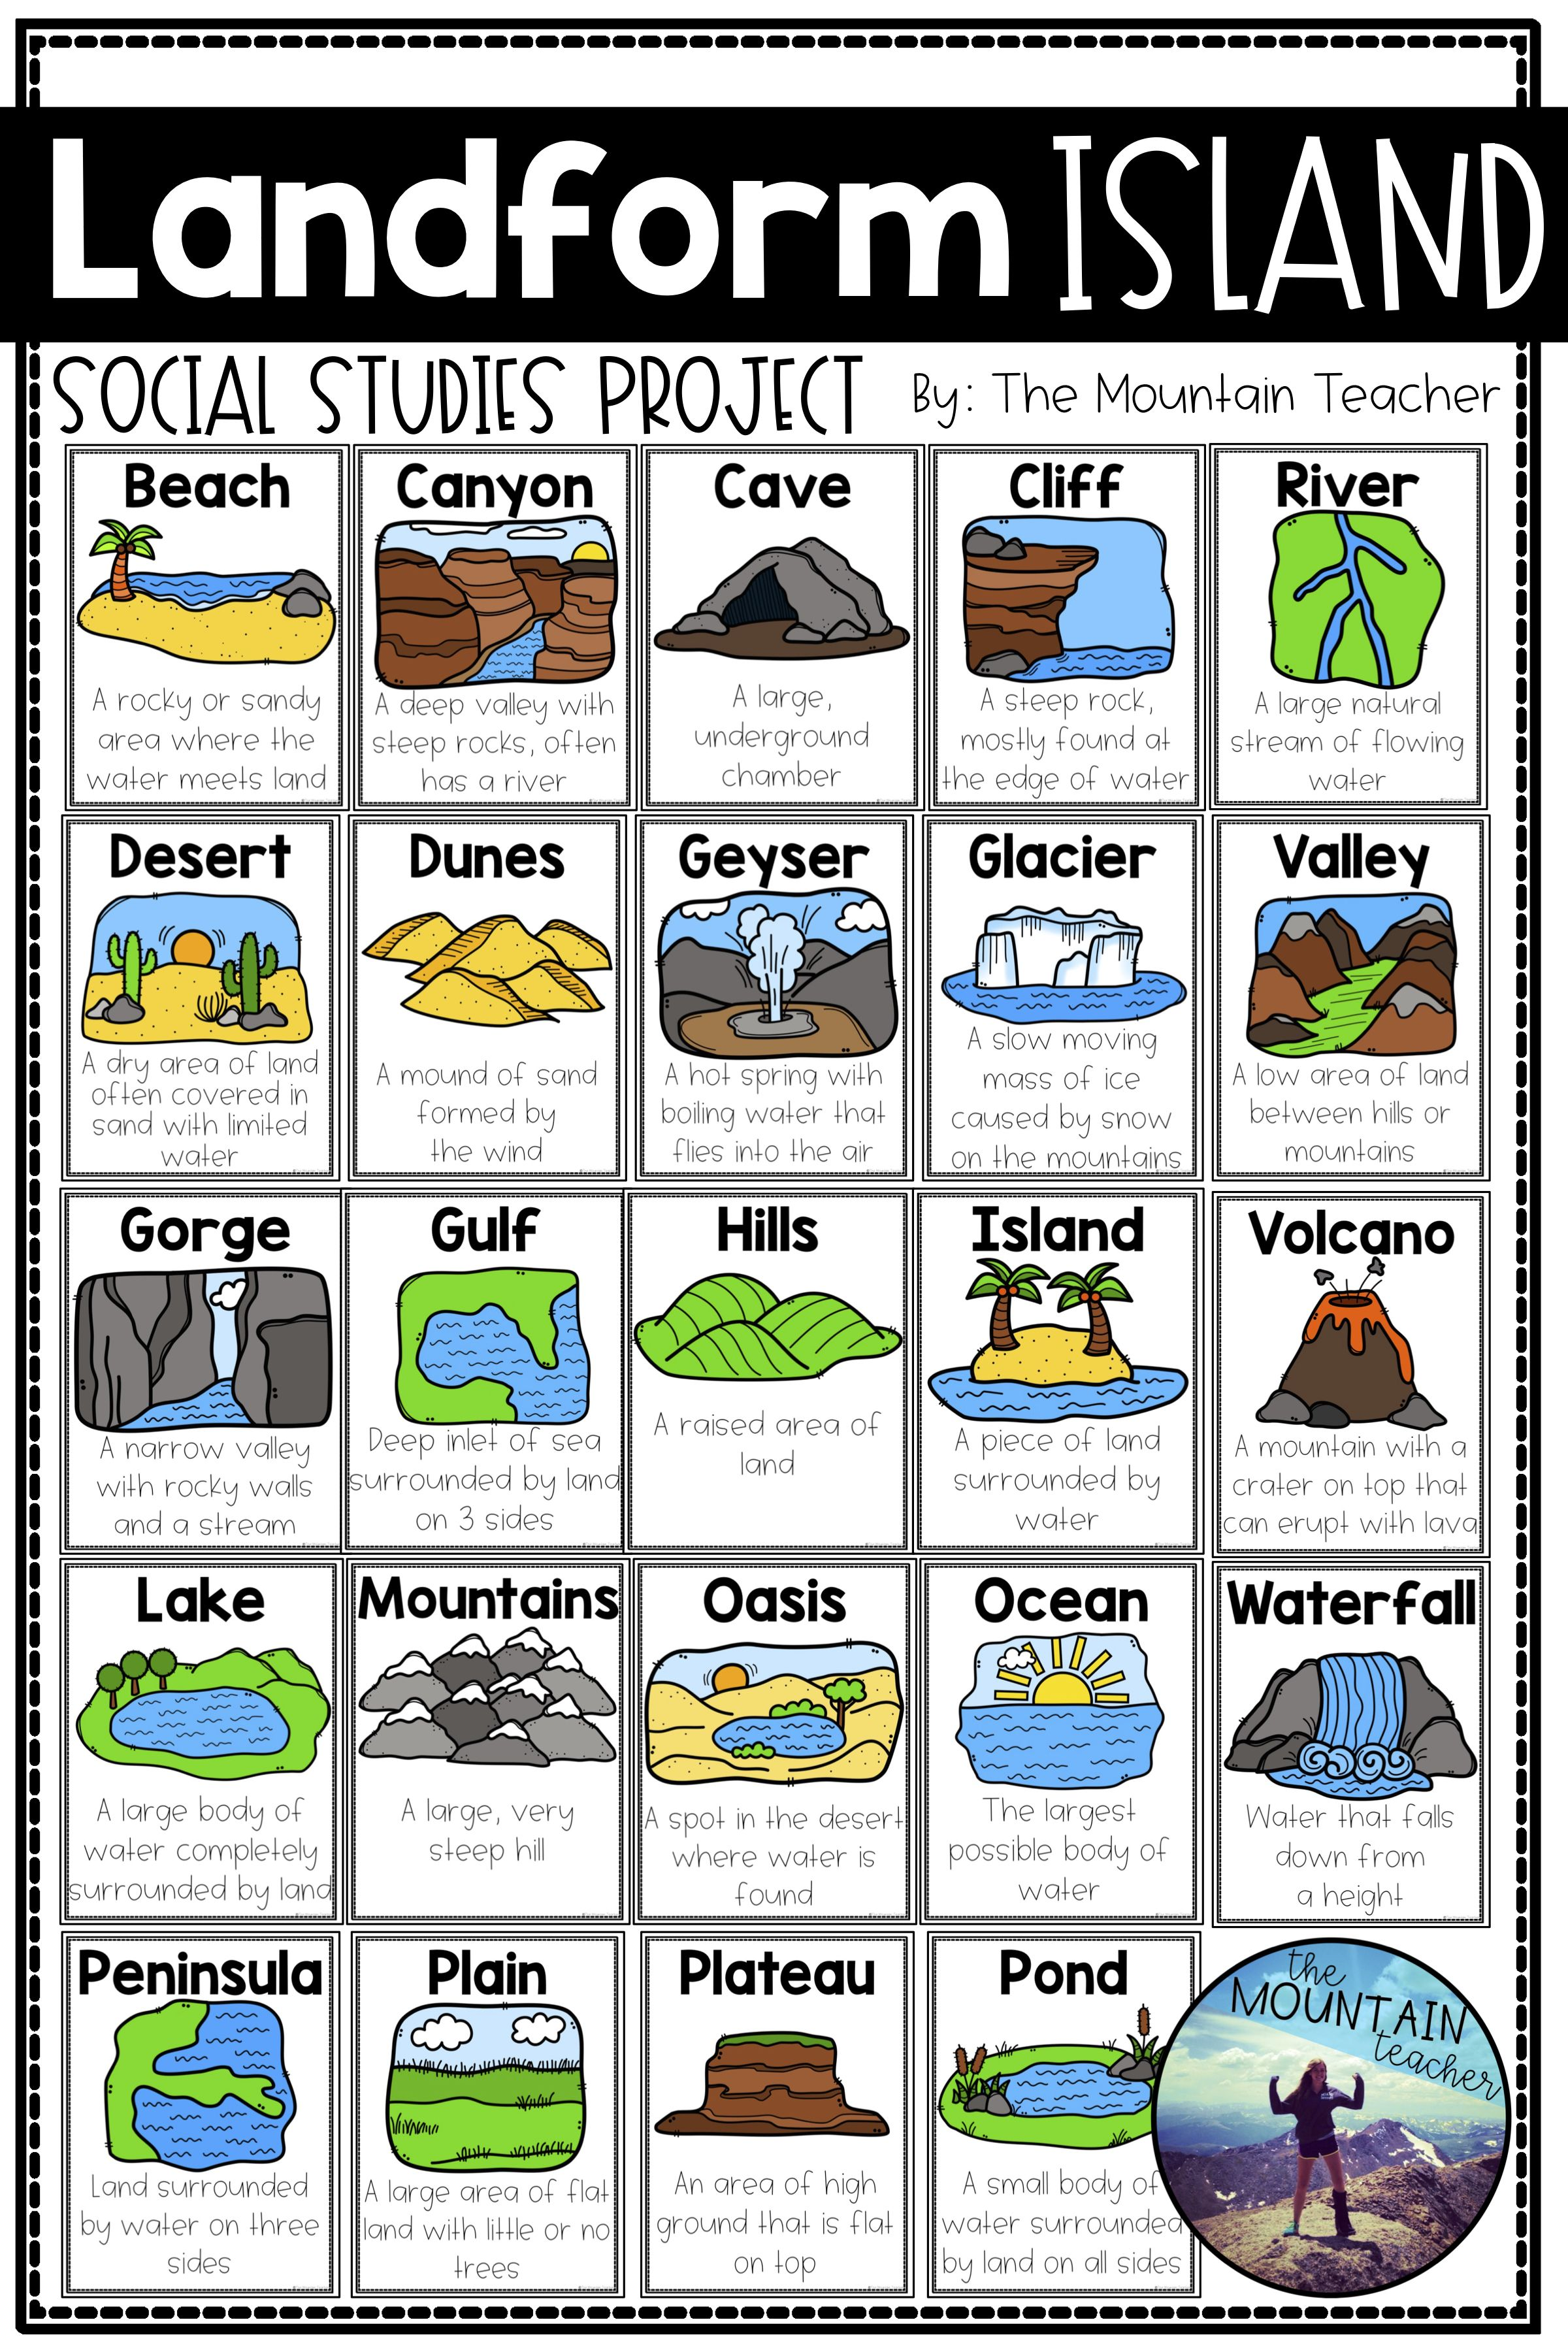 Landform Project Landform Island Teaching Geography Middle School Geography Social Studies Elementary